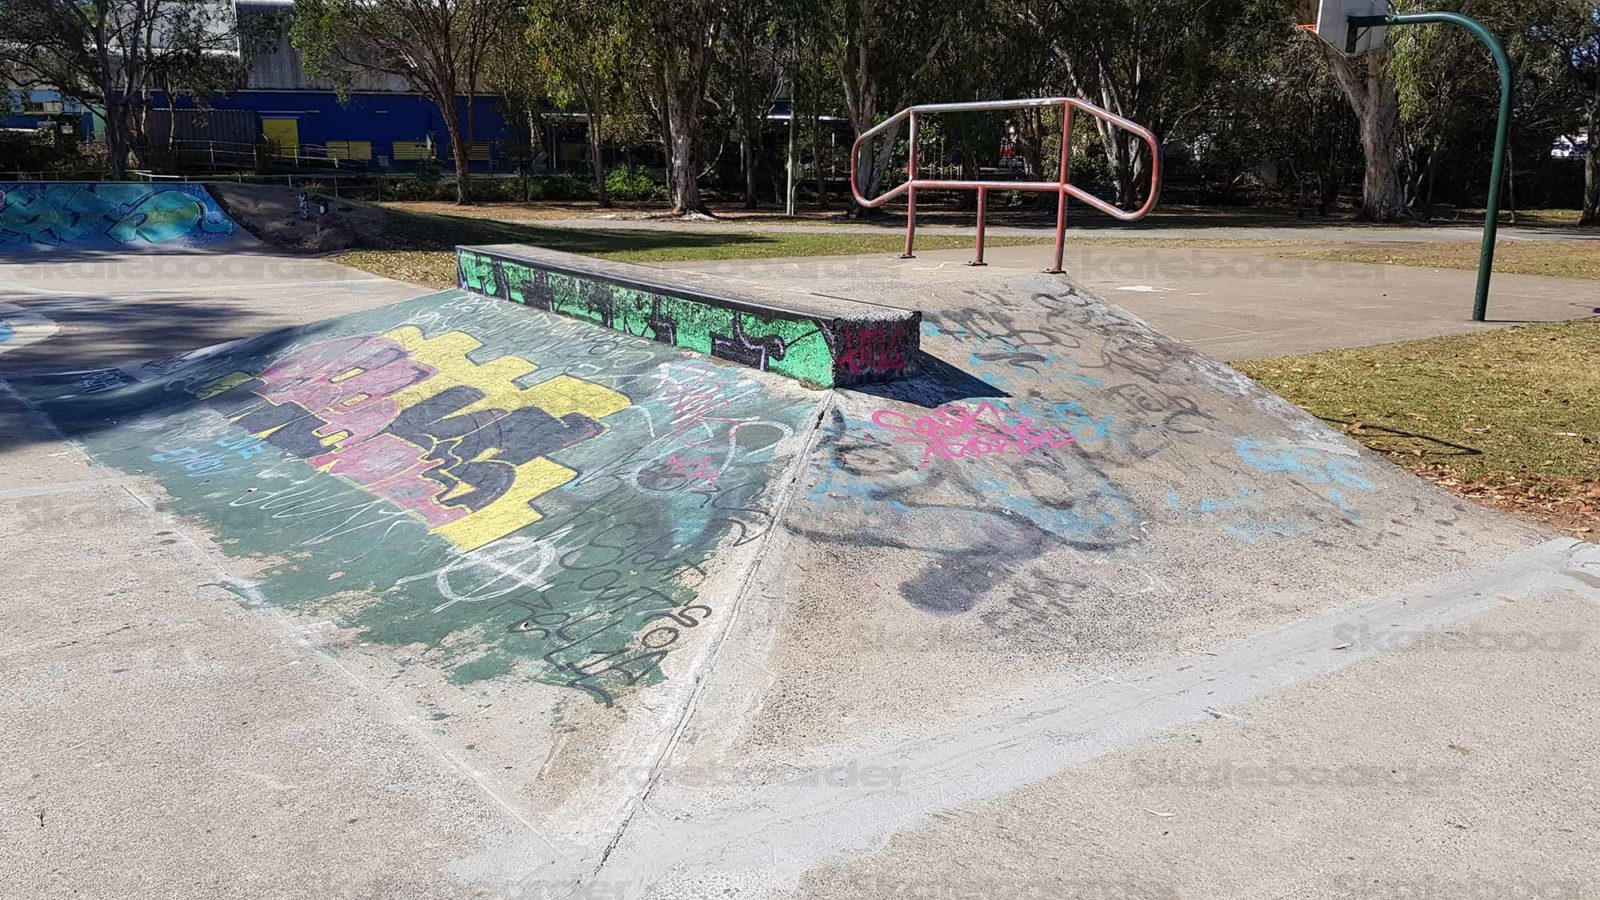 Fun box with ledge and rail at Lota Skatepark